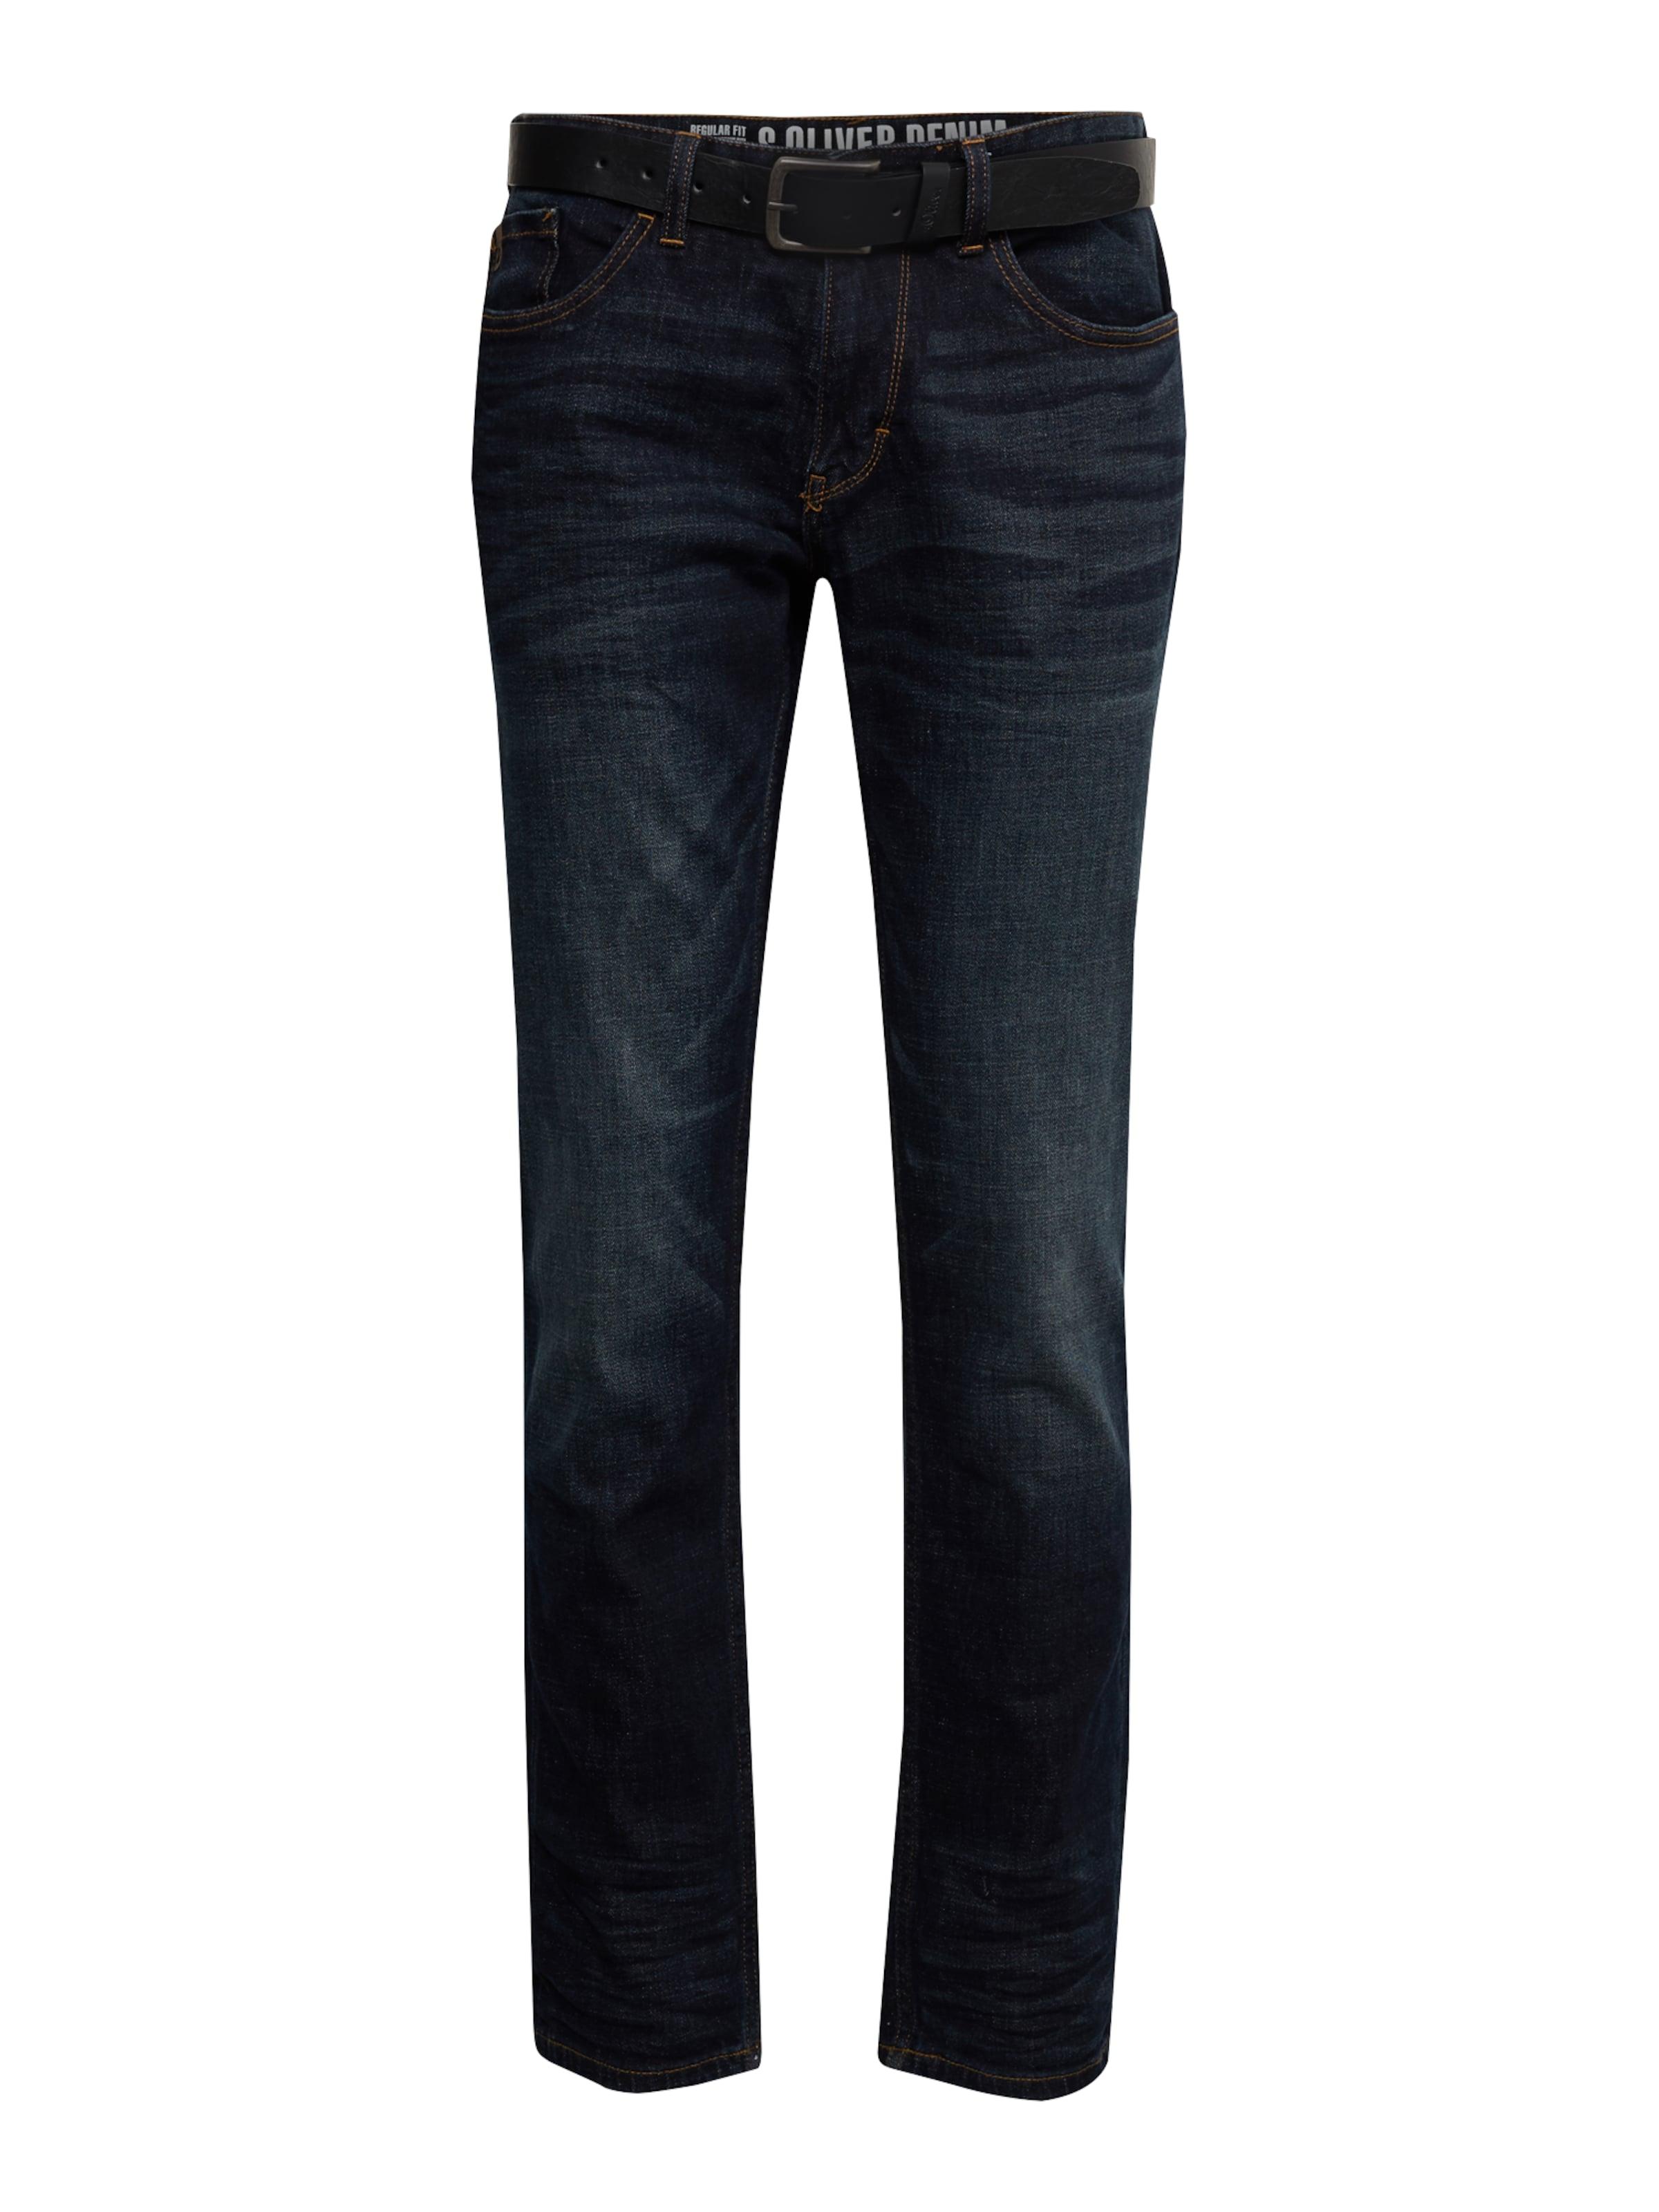 S In Red Dunkelblau Jeans Label oliver LqMVGSUzp